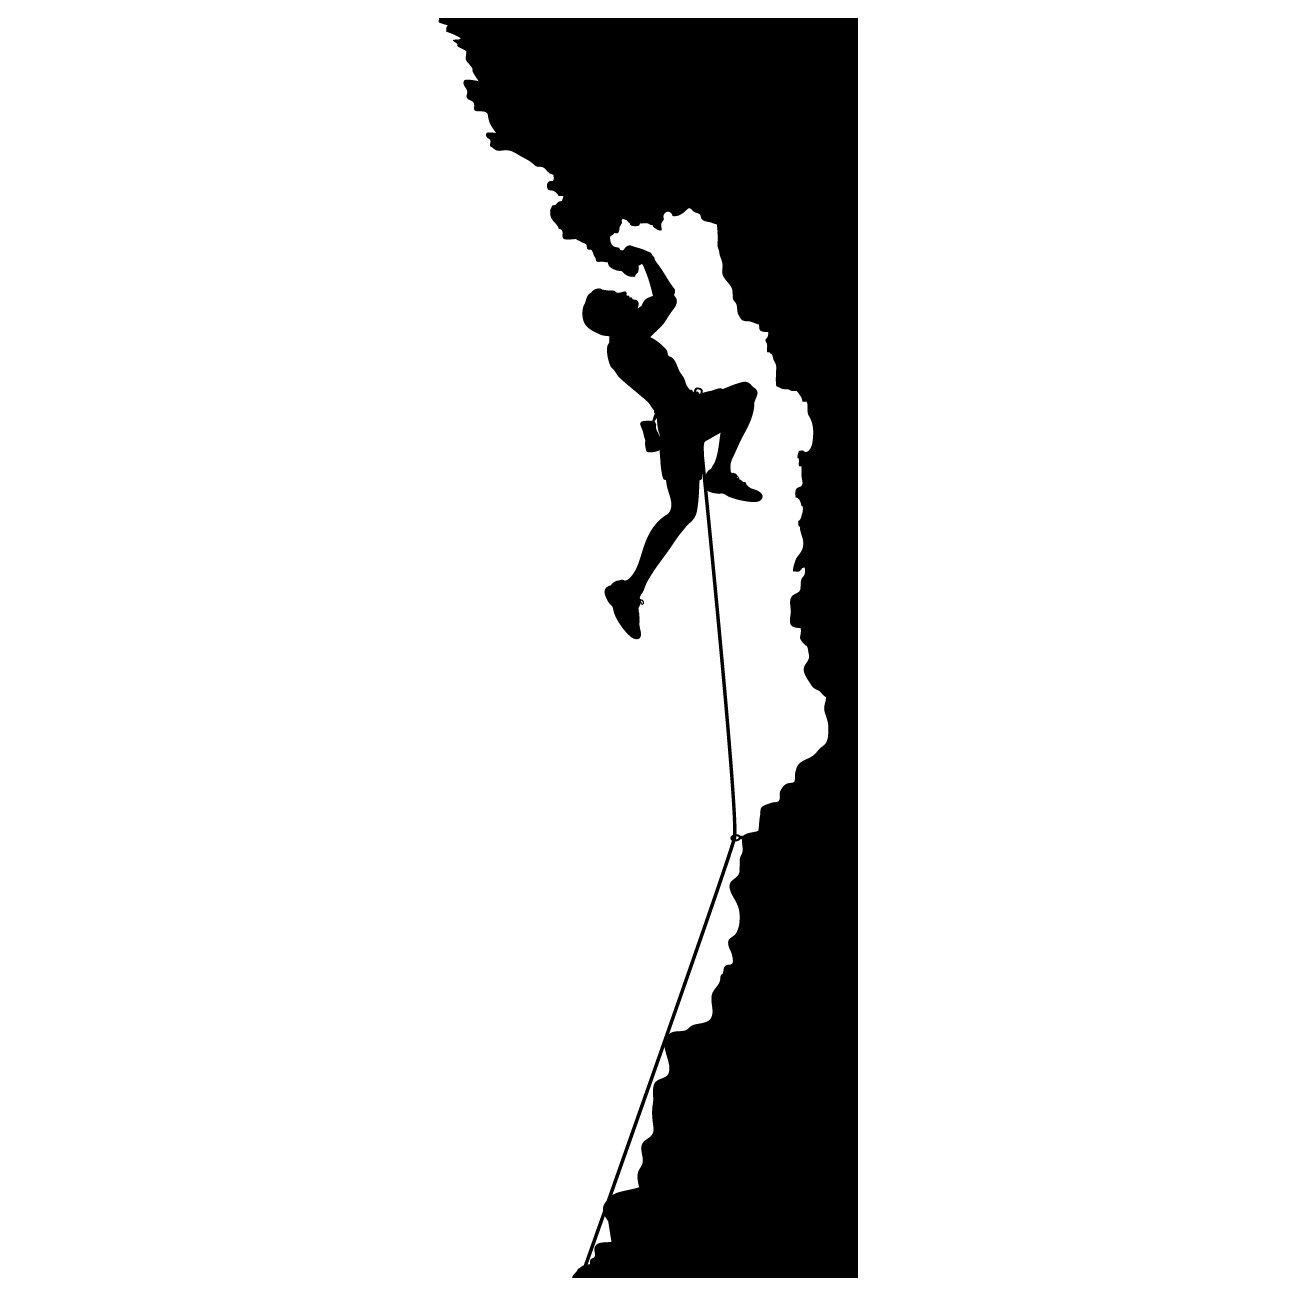 1296x1296 Climbing Logo Clipart Black And White